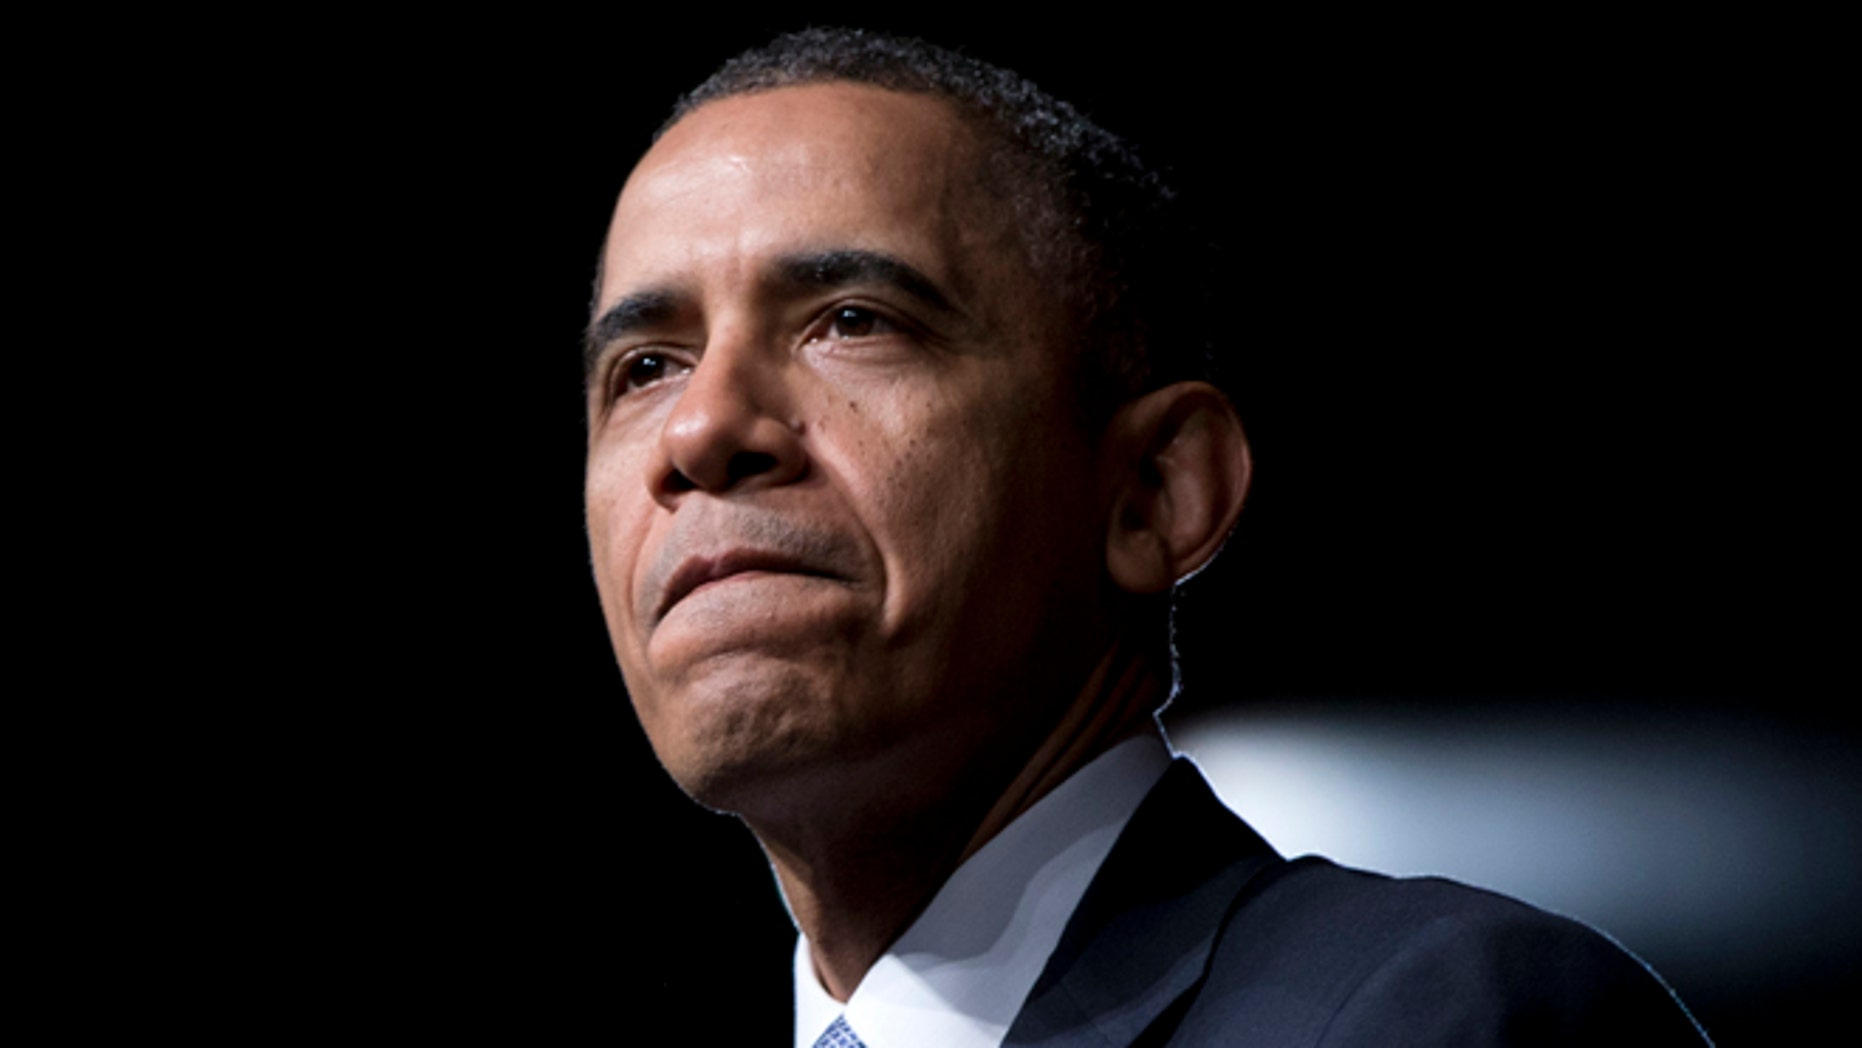 FILE: April 10, 2014: President Obama at the LBJ Presidential Library,  in Austin, Texas.